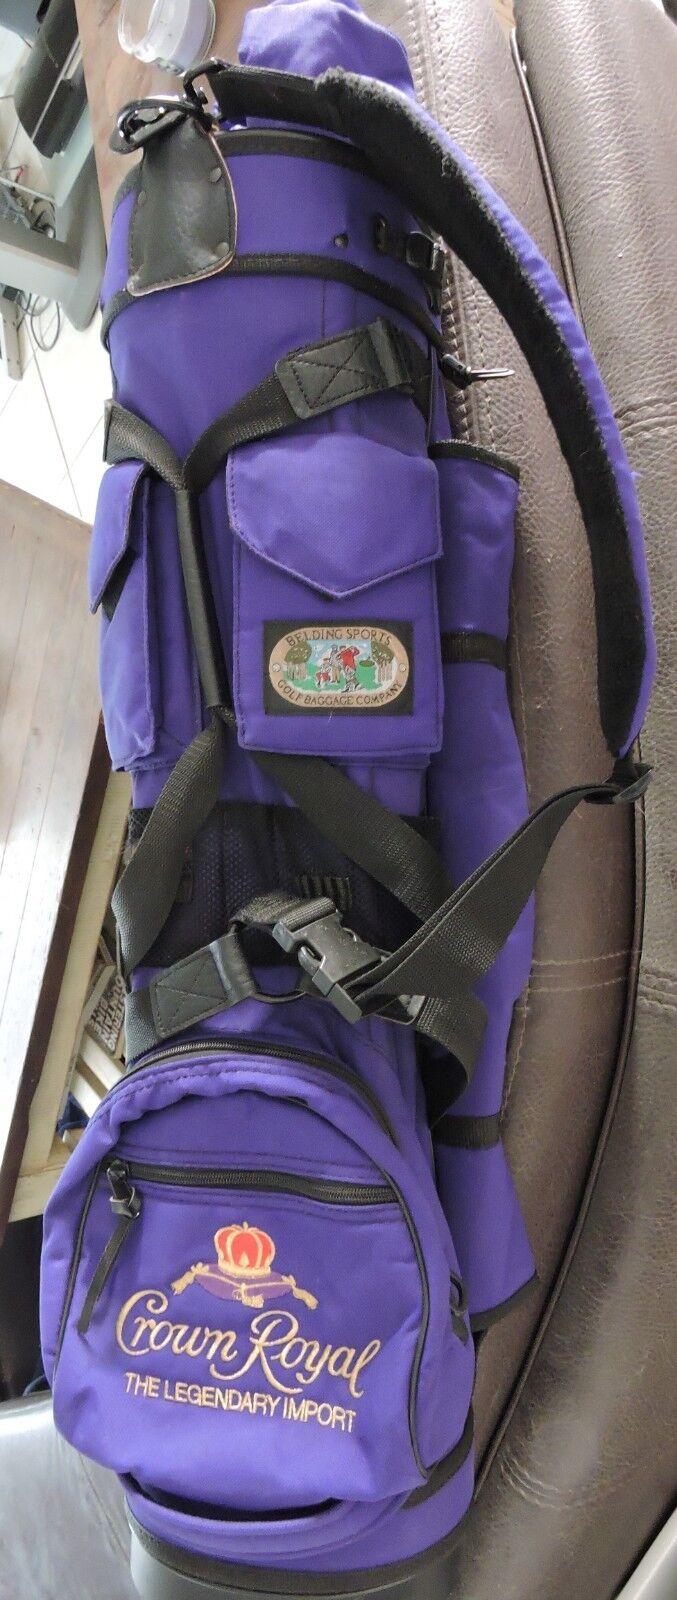 Photo Belding Original GB-905 Bushwhacker Golf Bag Purple Crown Royal Limited Edition